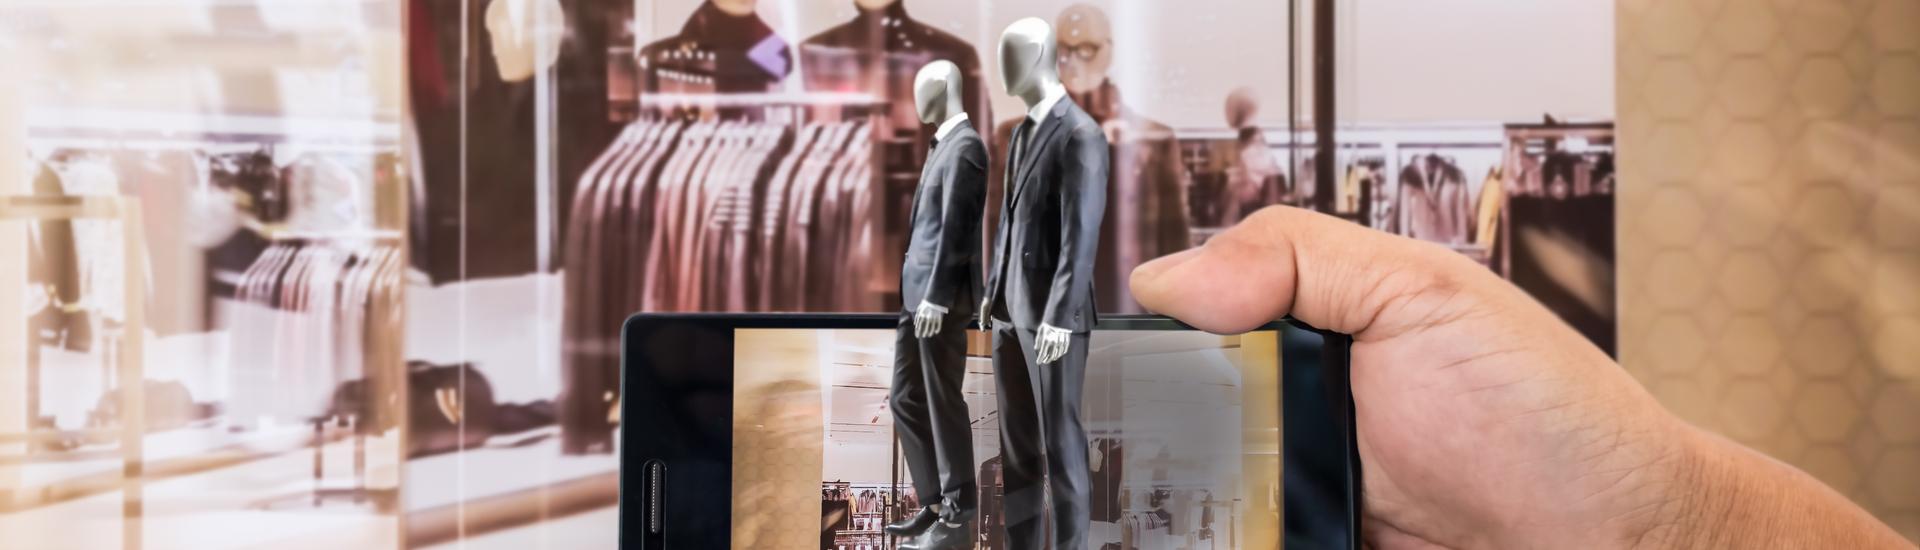 Augmented Reality και οι εφαρμογές του στο Marketing